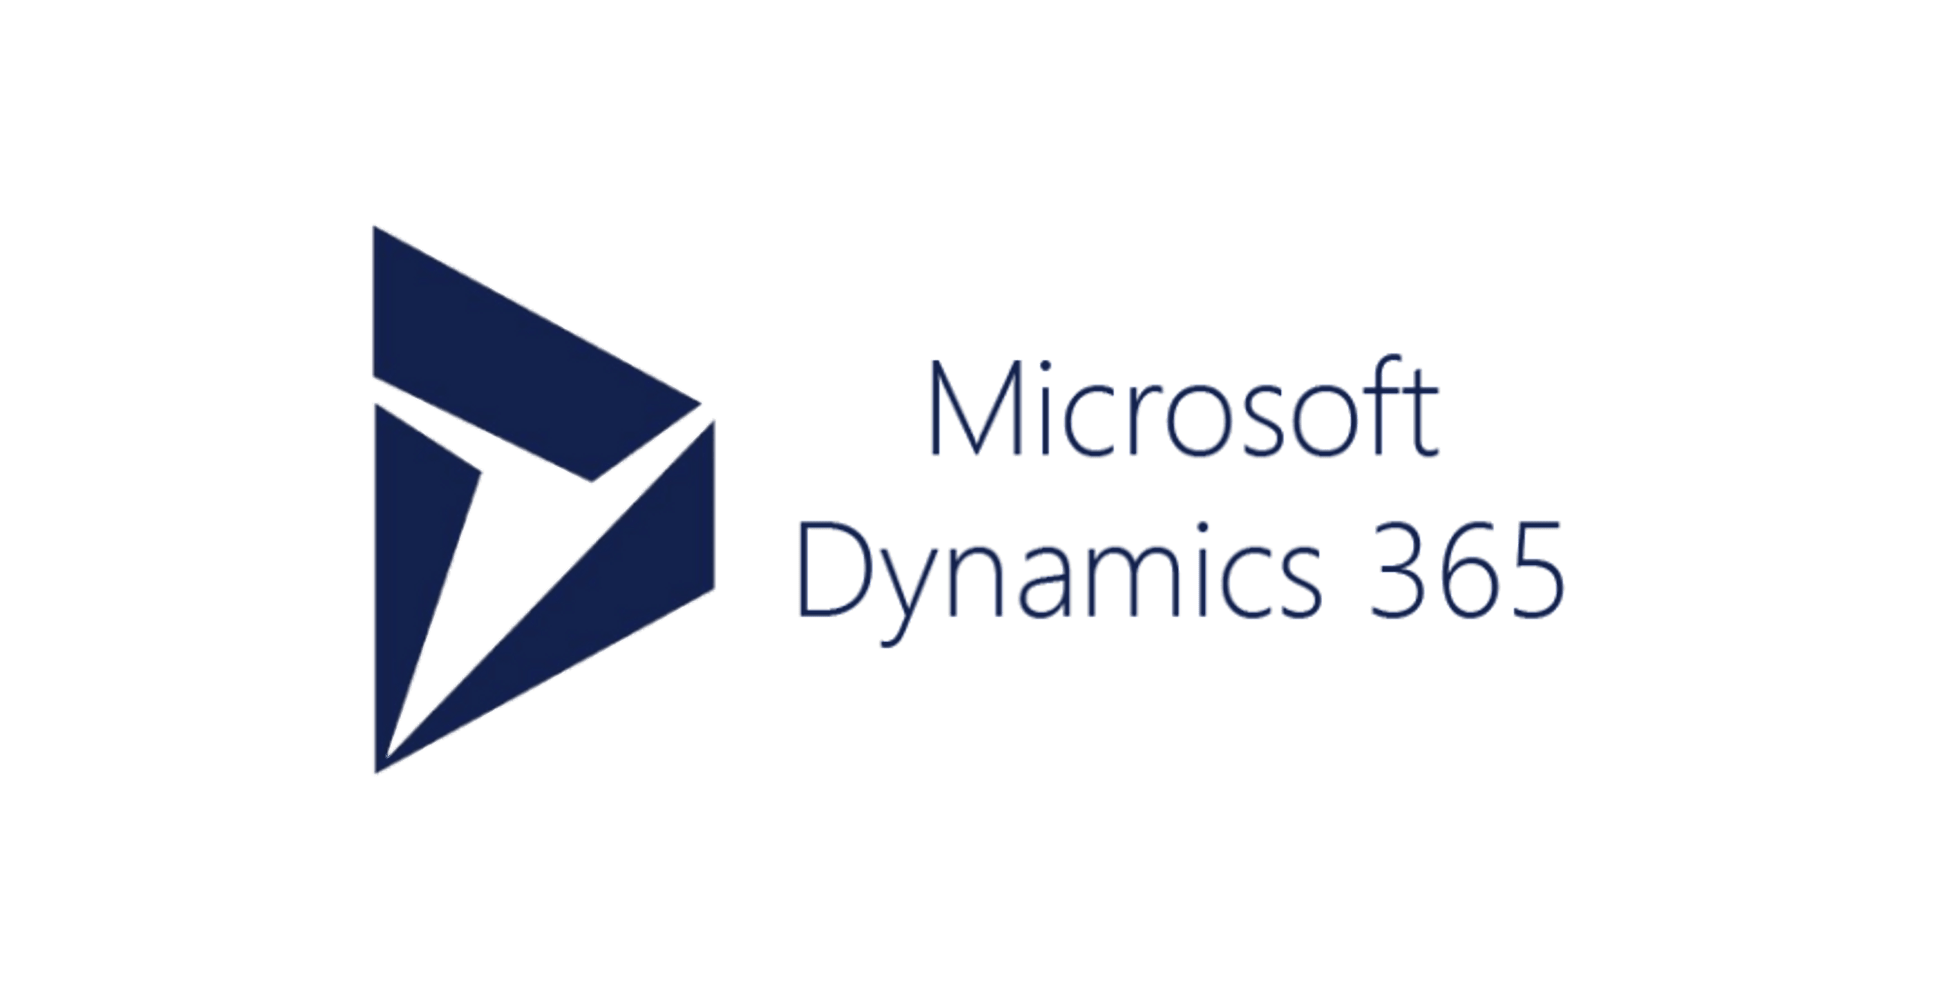 Dynamics 365 News